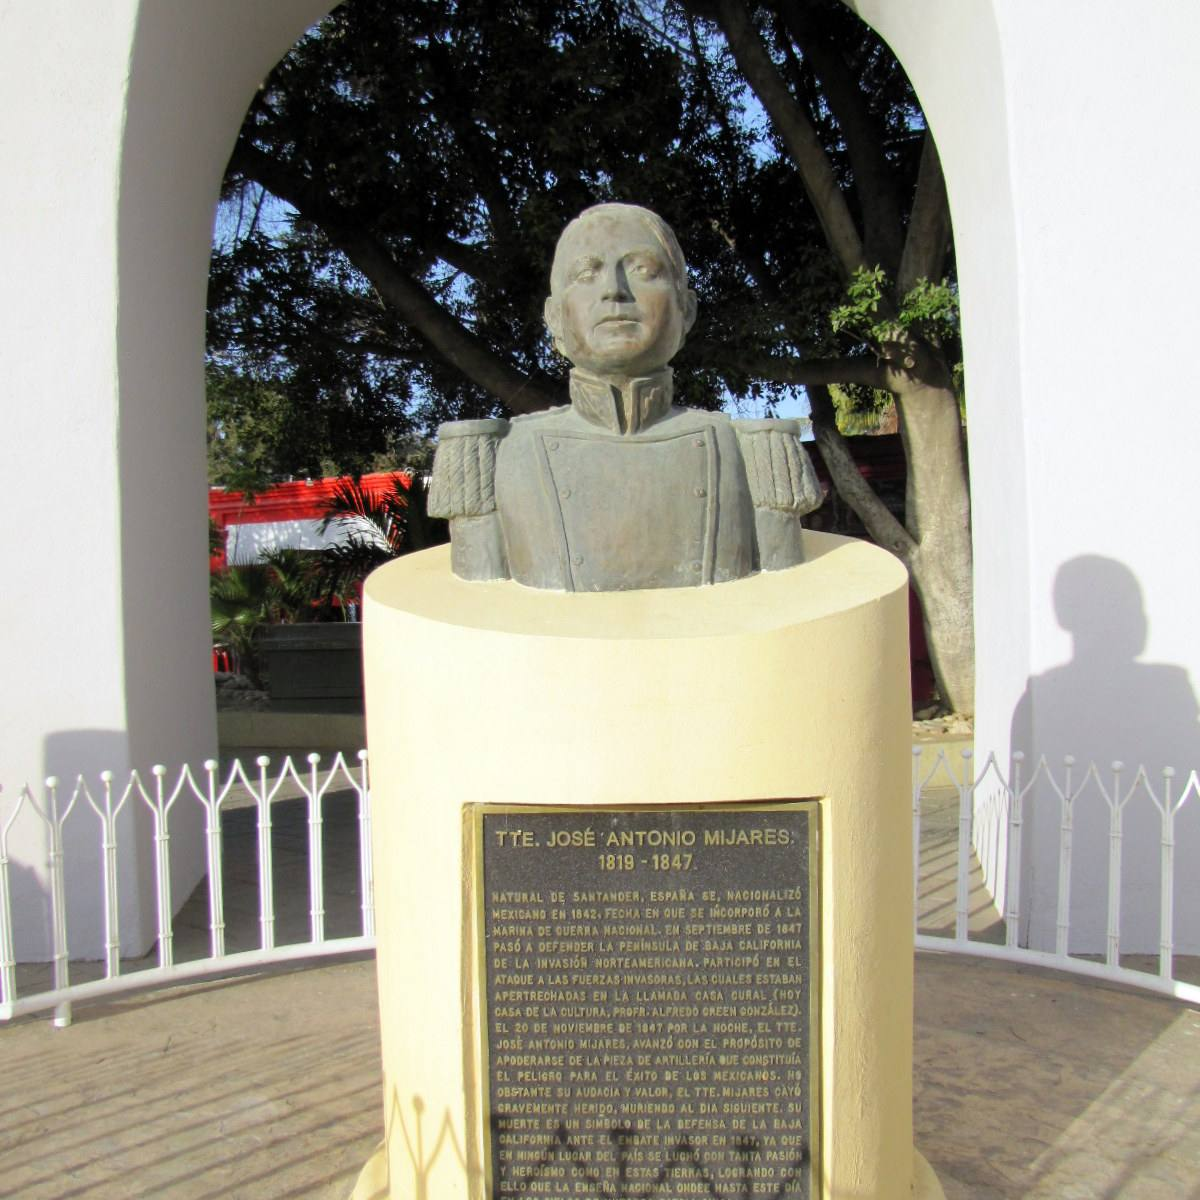 Monument to Mijares in San Jose del Cabo